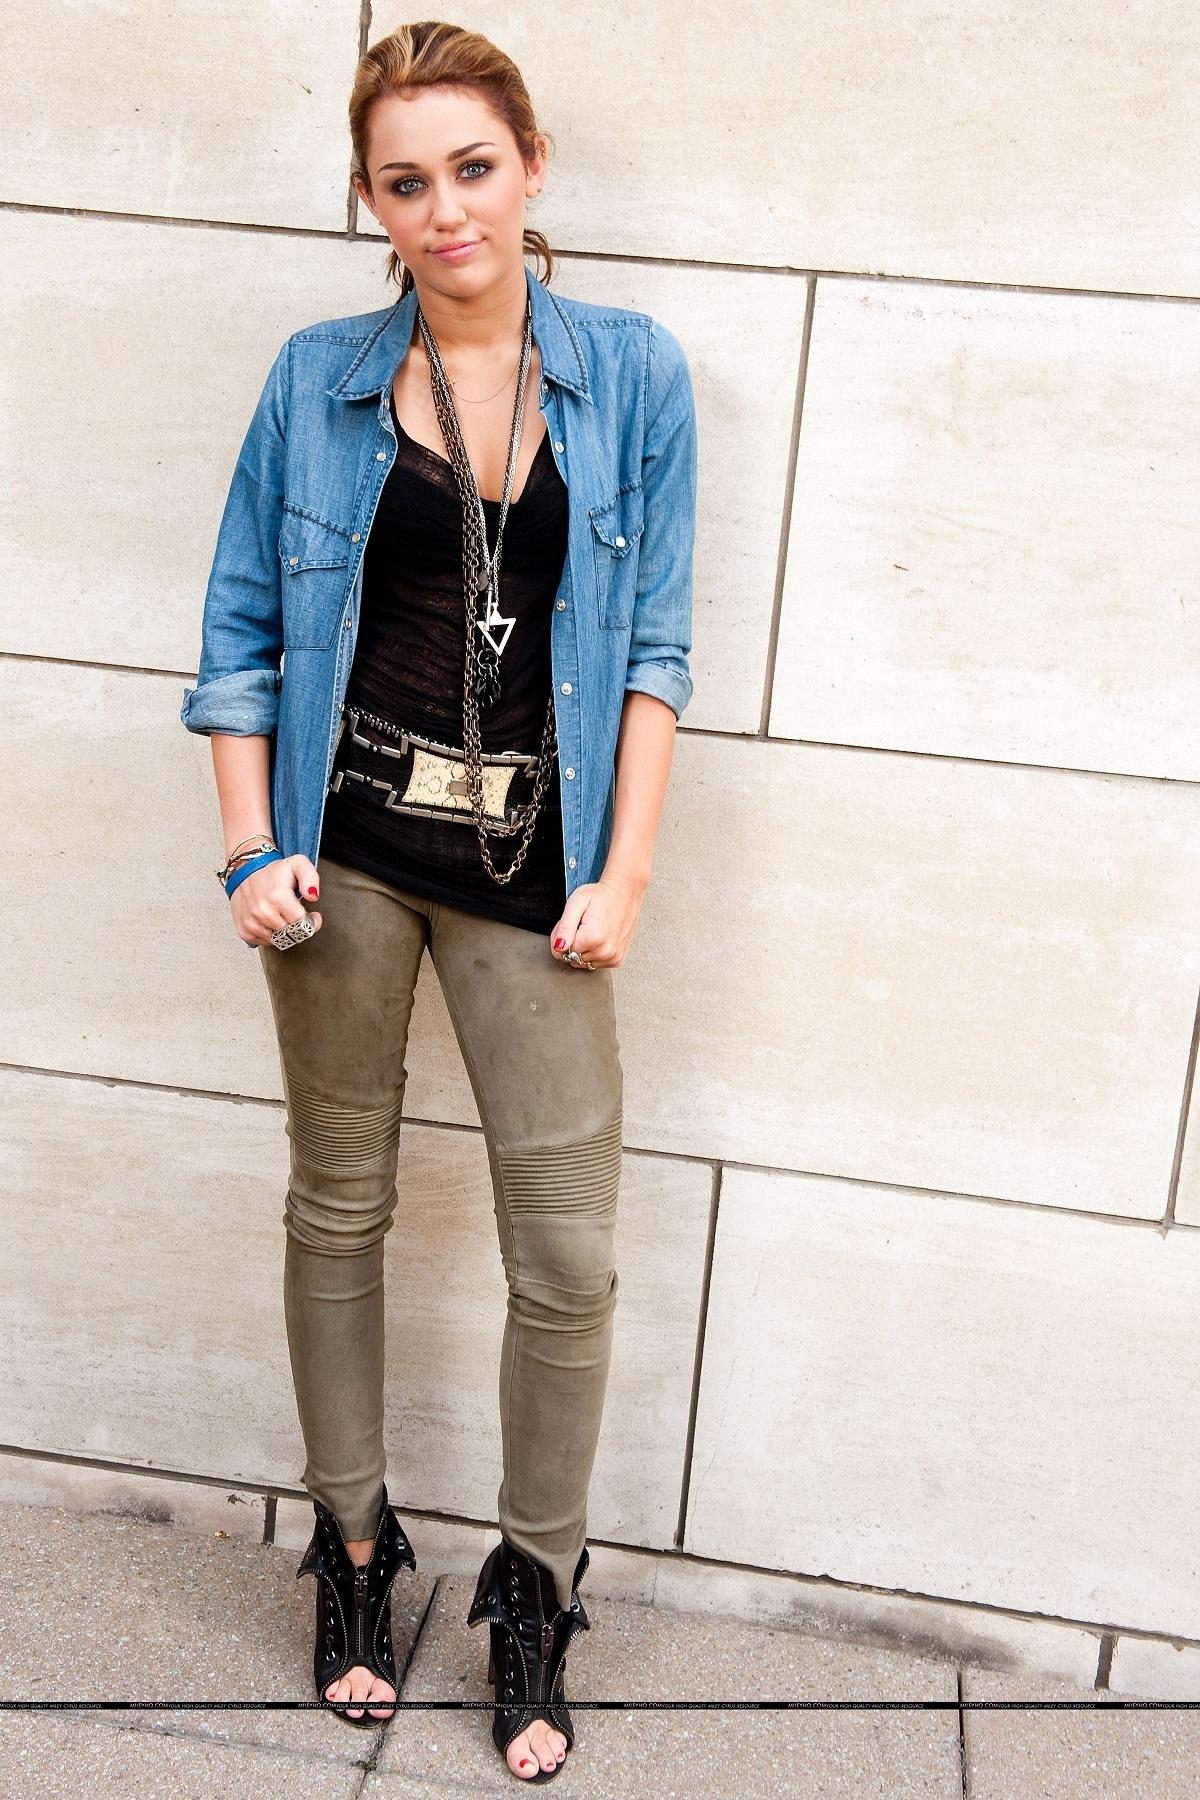 Miley Photo - miley-cyrus photo